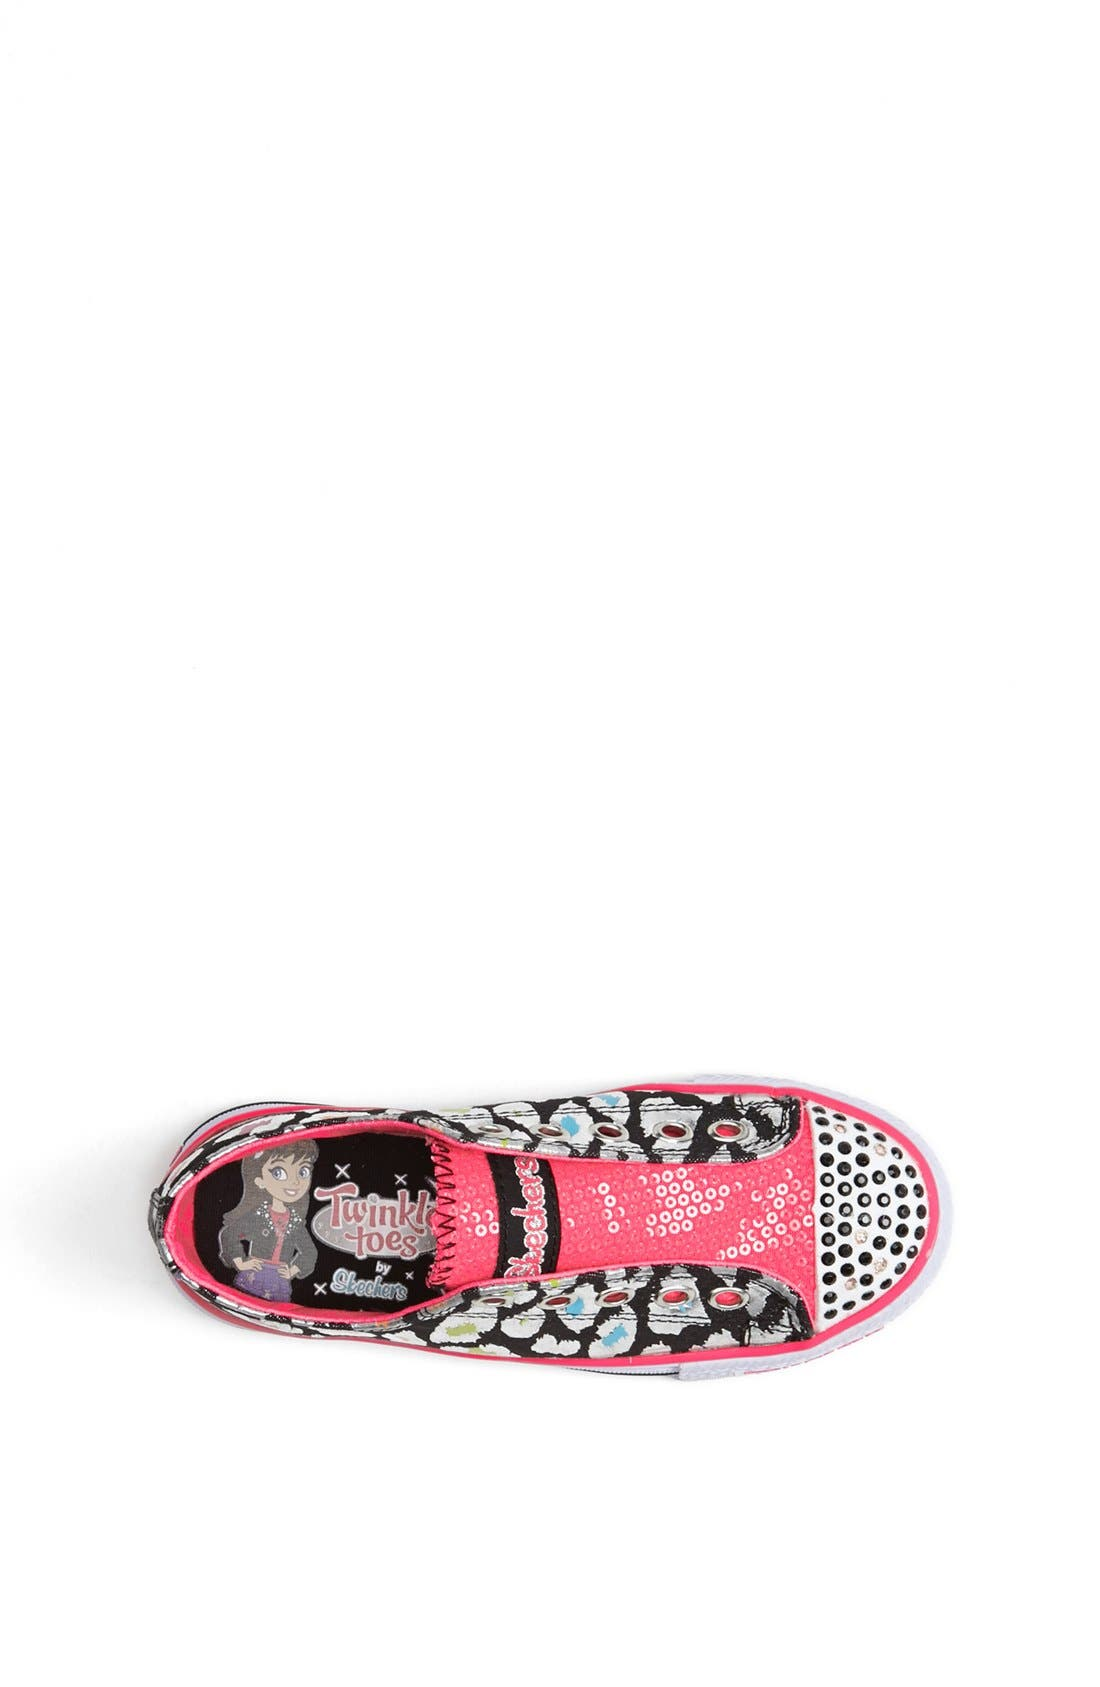 Alternate Image 3  - SKECHERS 'Twinkle Toes' Light-Up Sneaker (Toddler & Little Kid)